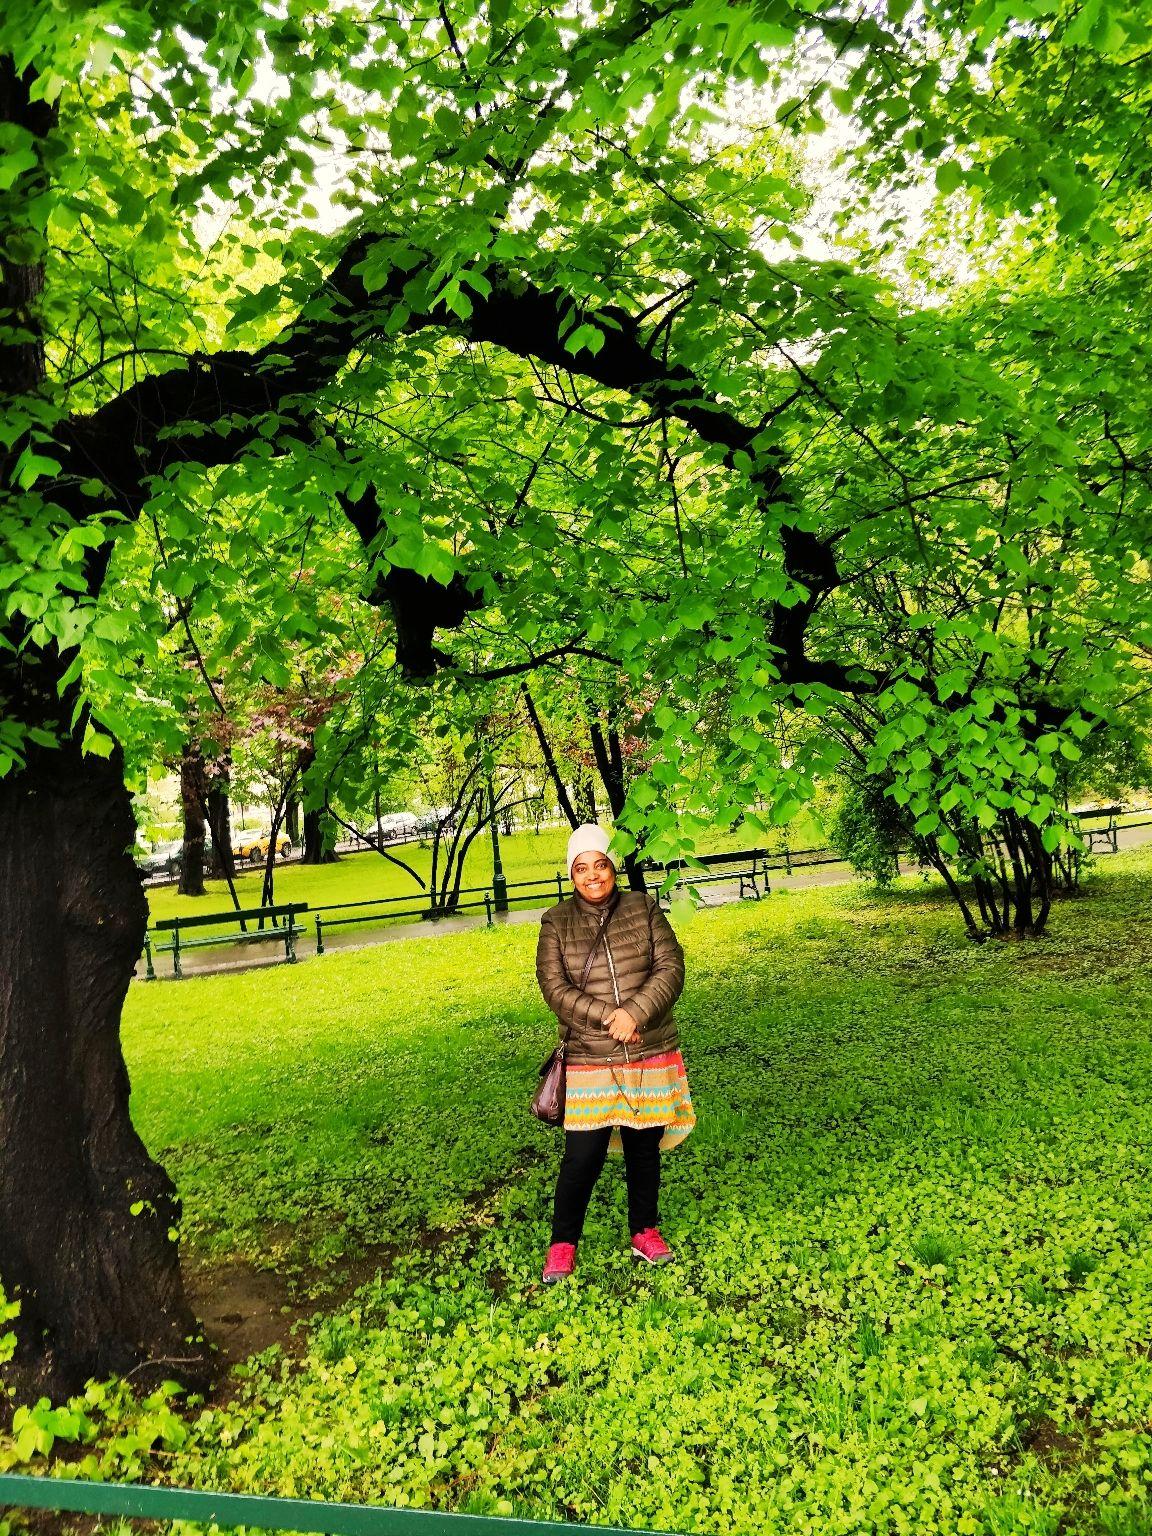 Photo of Warsaw By Mazzanilife